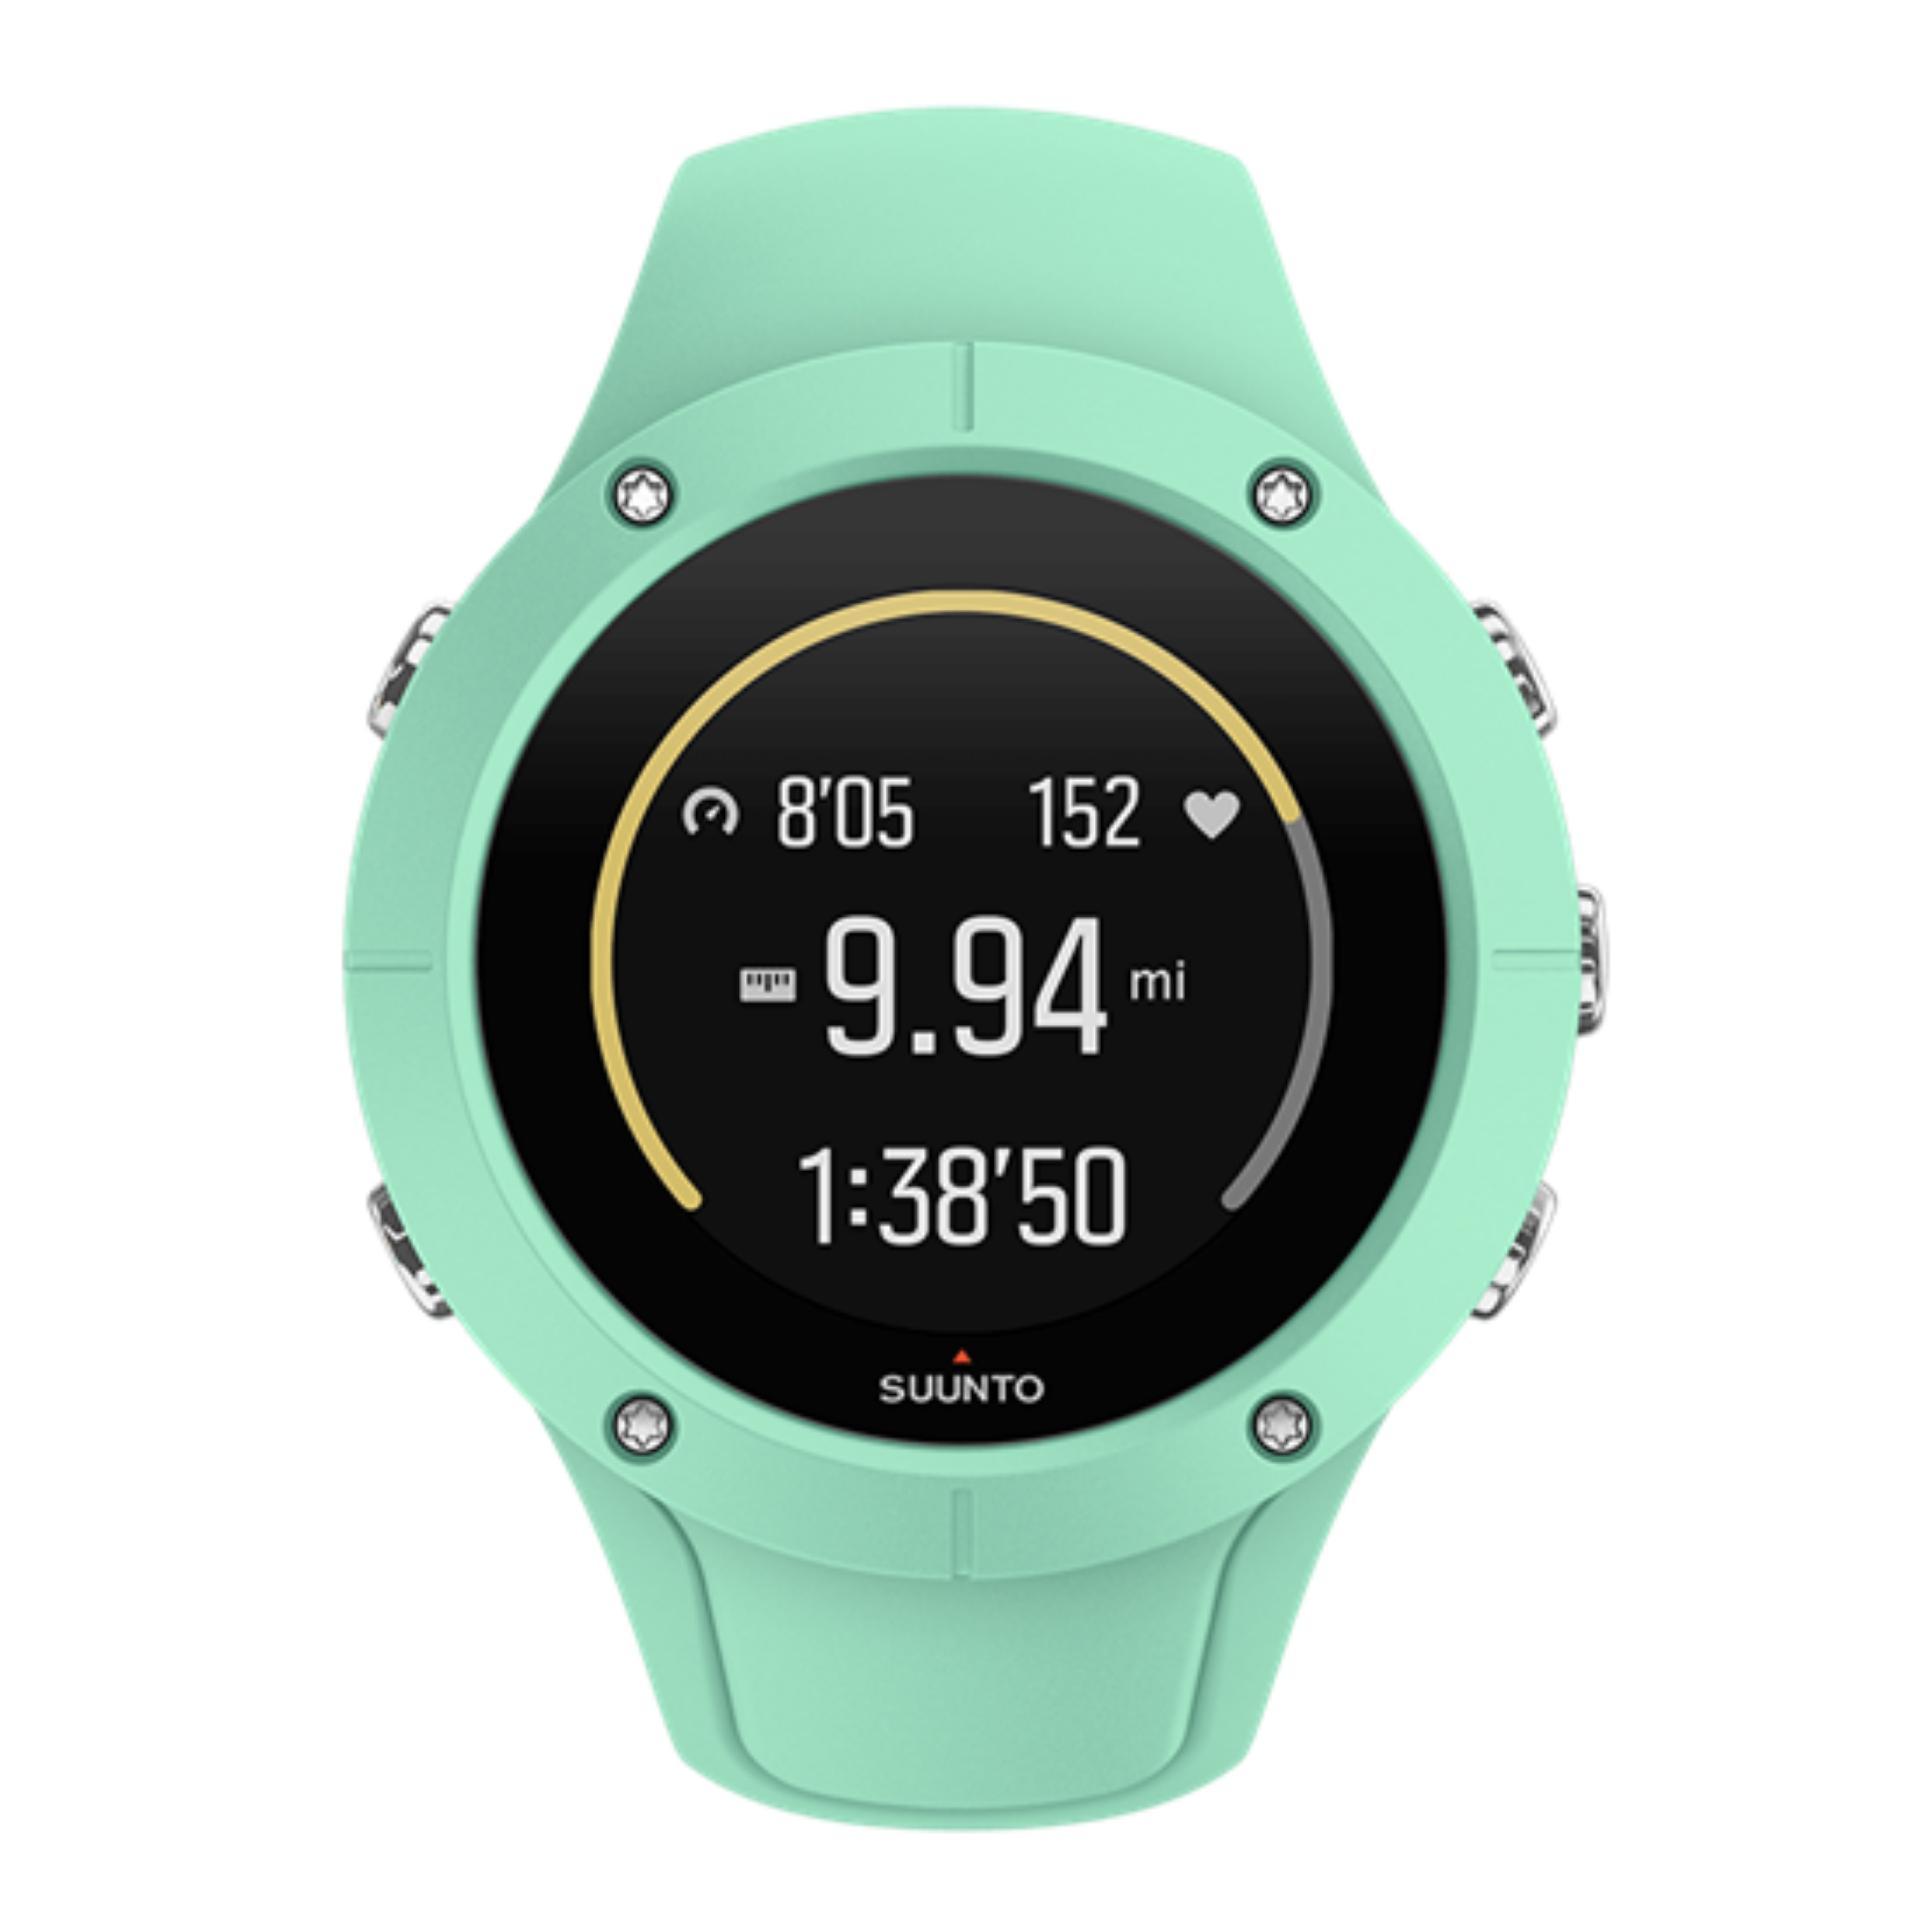 Suunto Philippines Price List Watches Watch Accessories Traverse Black Outdoor With Gps Glonass Spartan Trainer Multifunction Sports Ss022670000